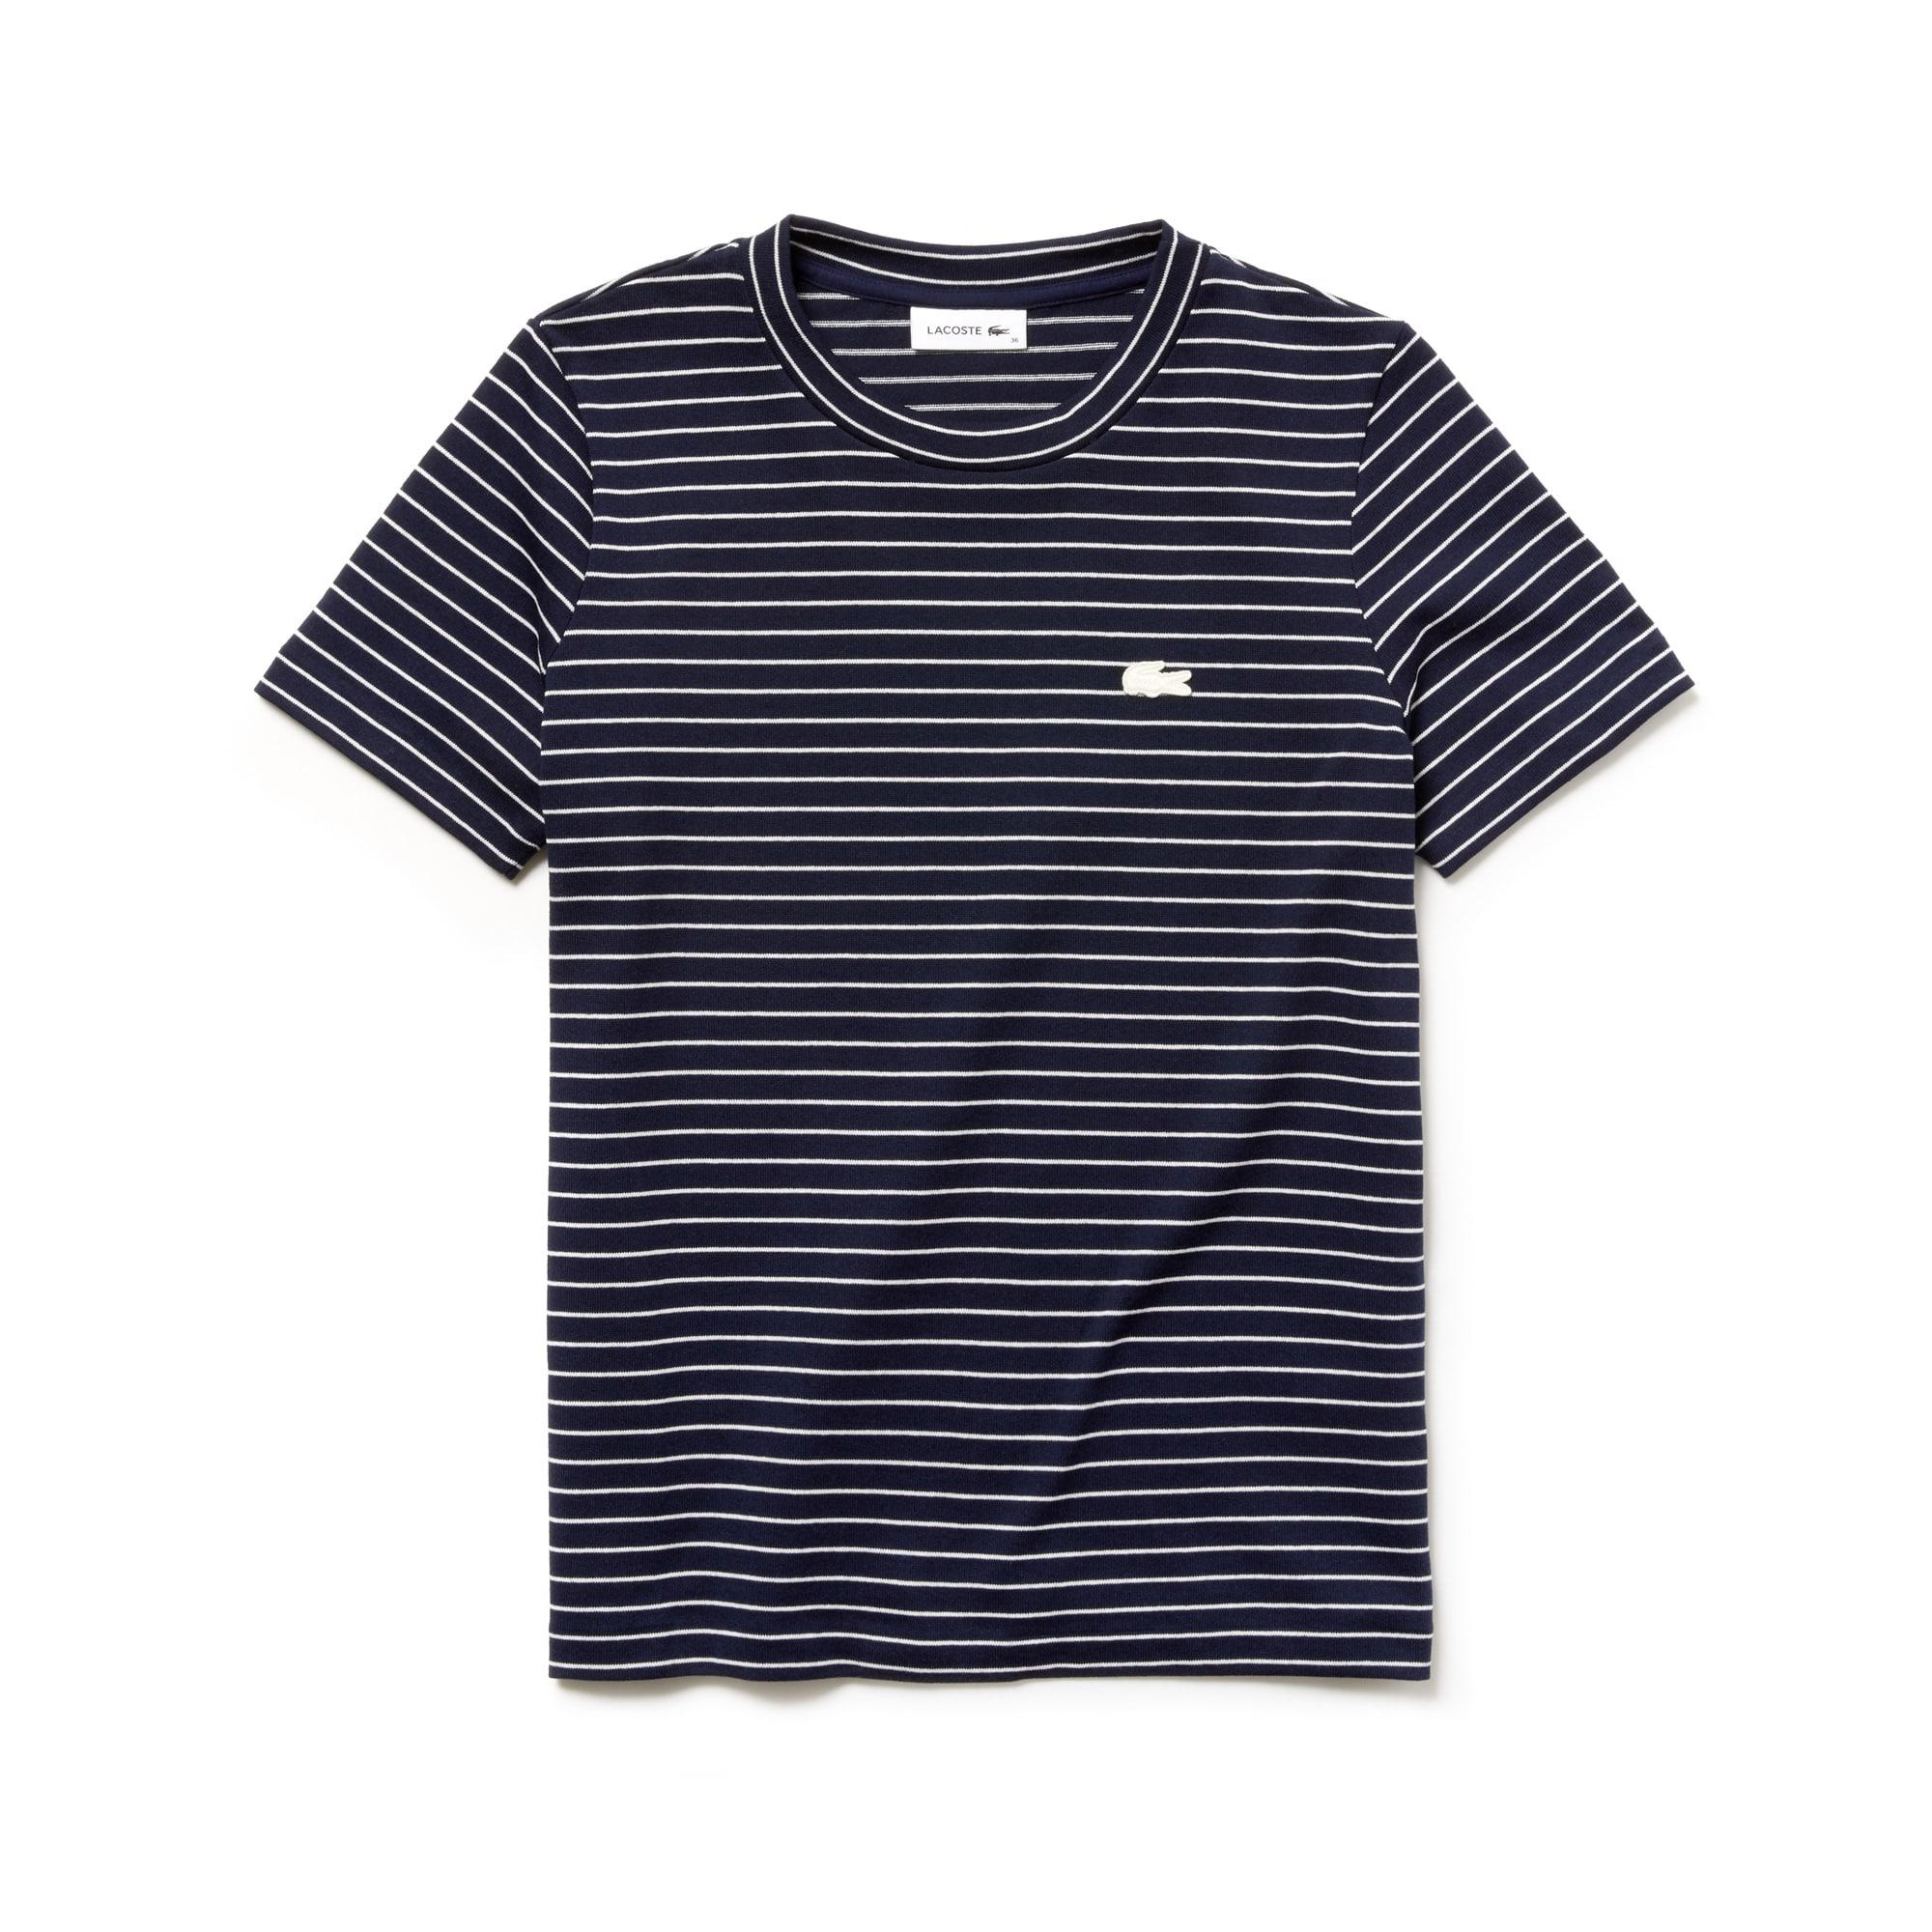 Women's Crew Neck Striped Cotton Jersey T-shirt